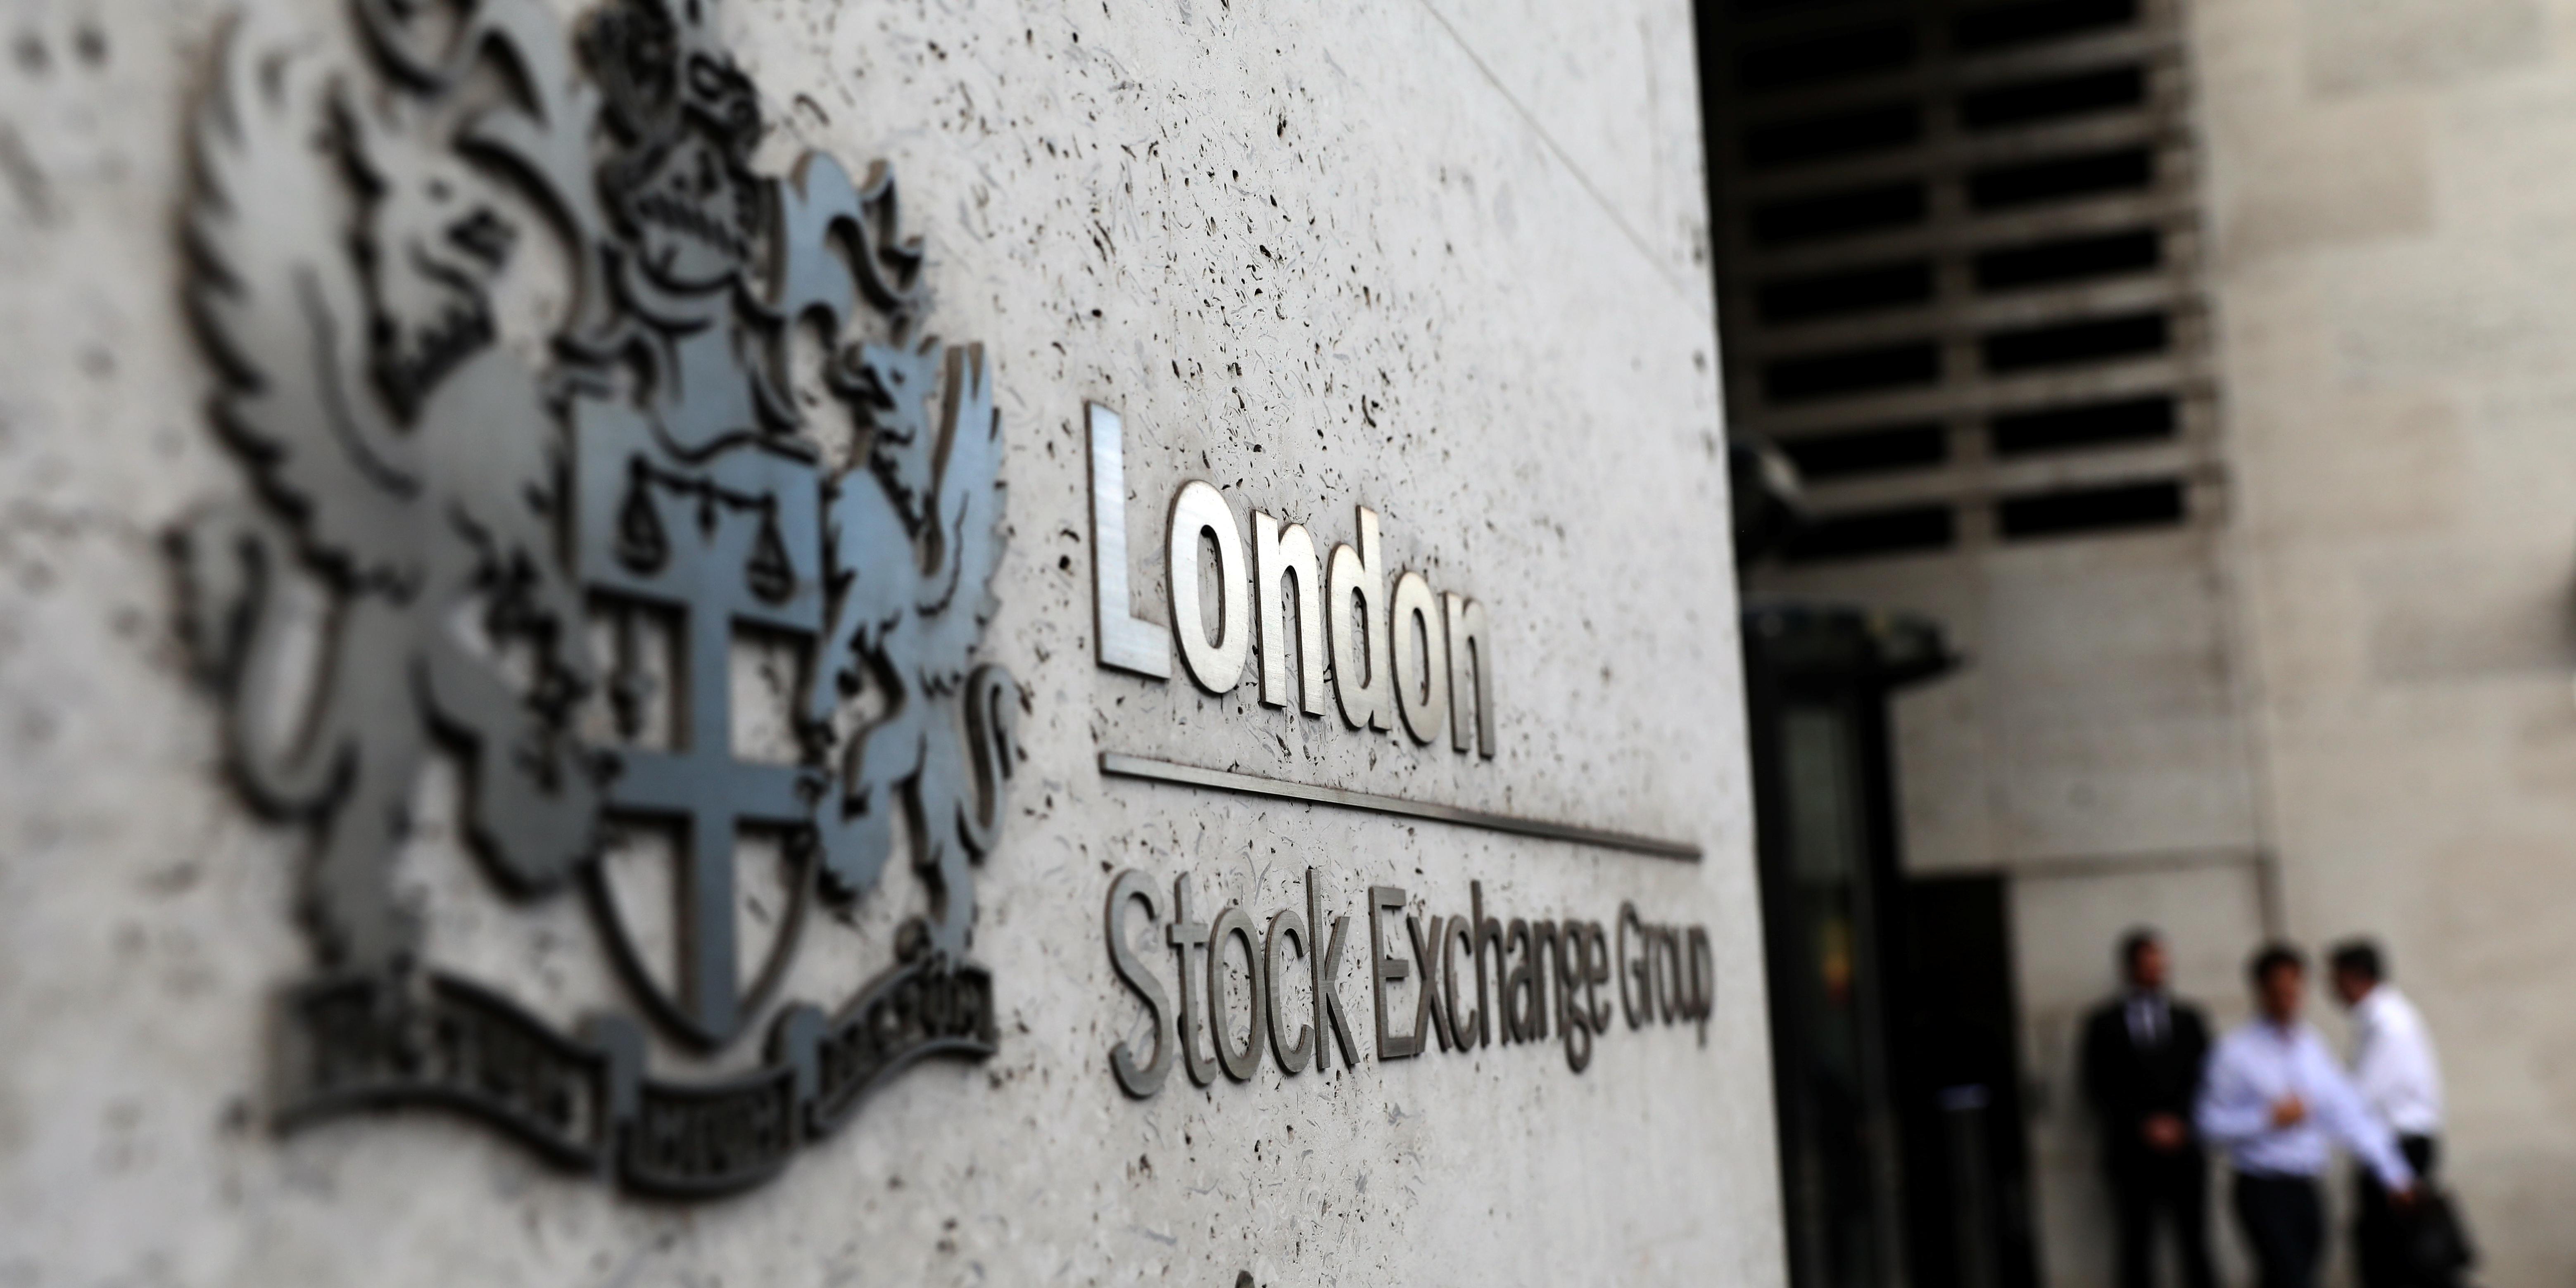 London open: Stocks steady as investors mull HSBC numbers, IWG